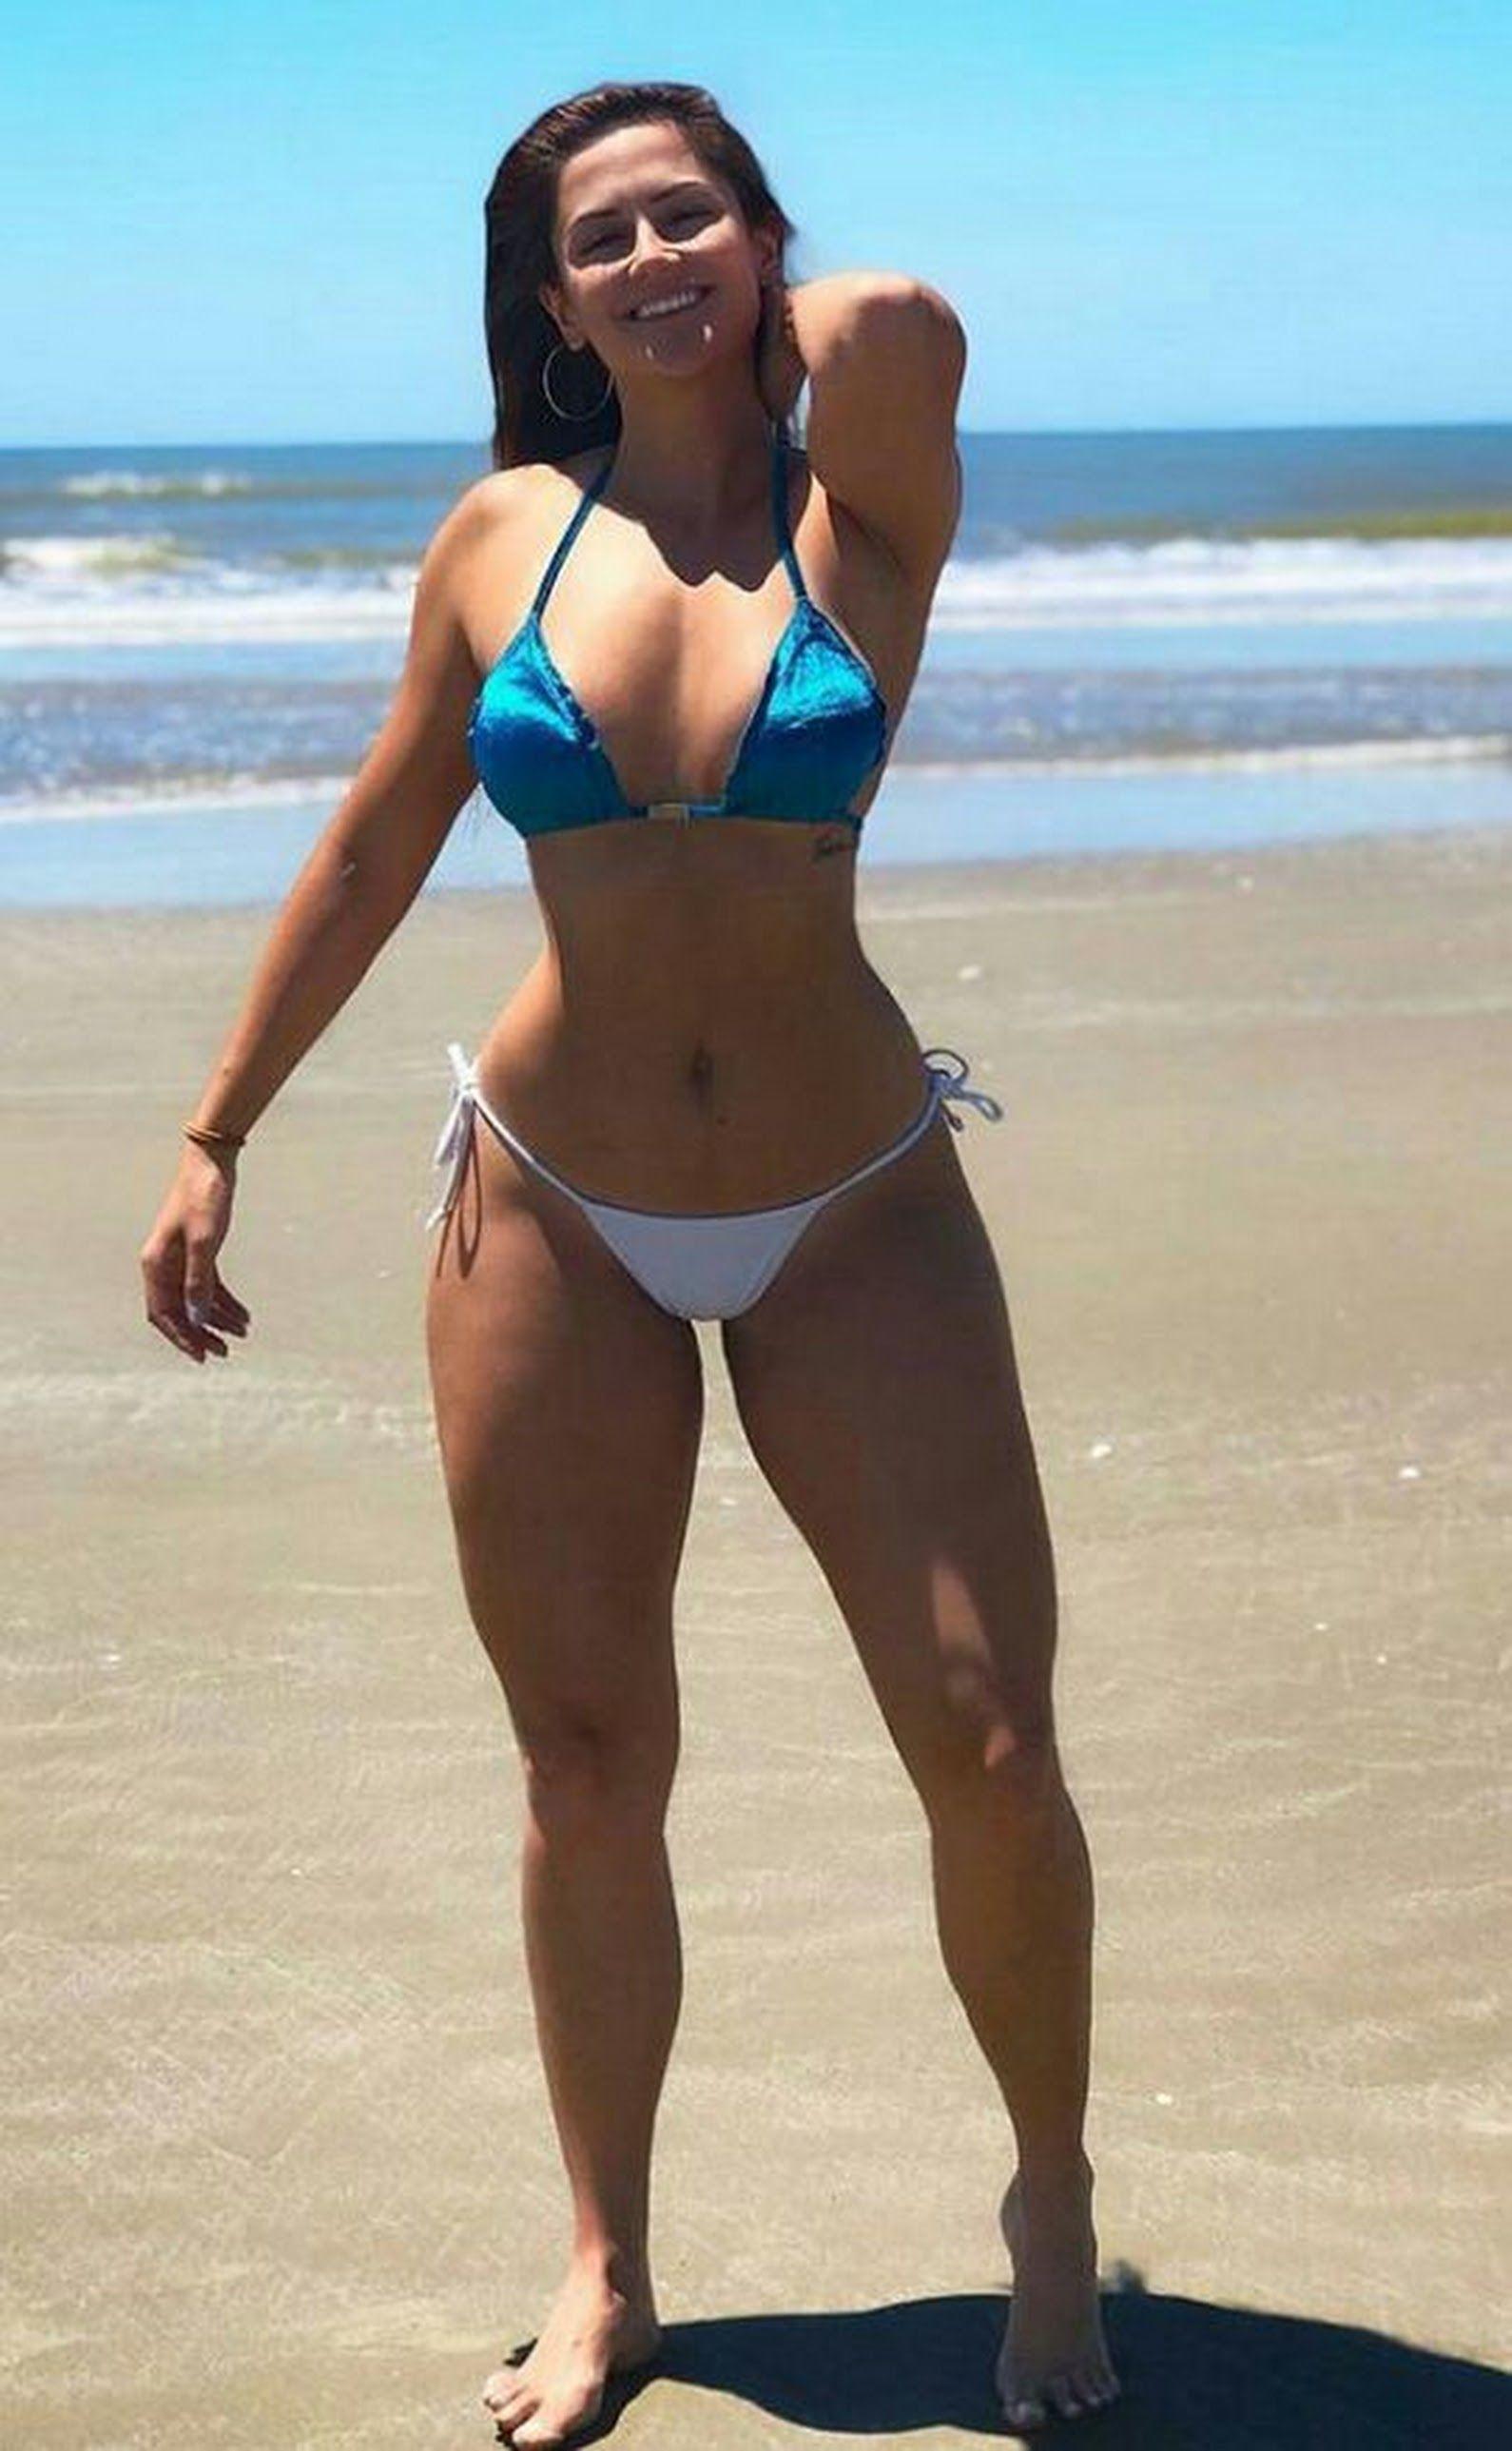 Bikini Hargitai Henrietta nudes (32 photos), Pussy, Paparazzi, Instagram, butt 2018